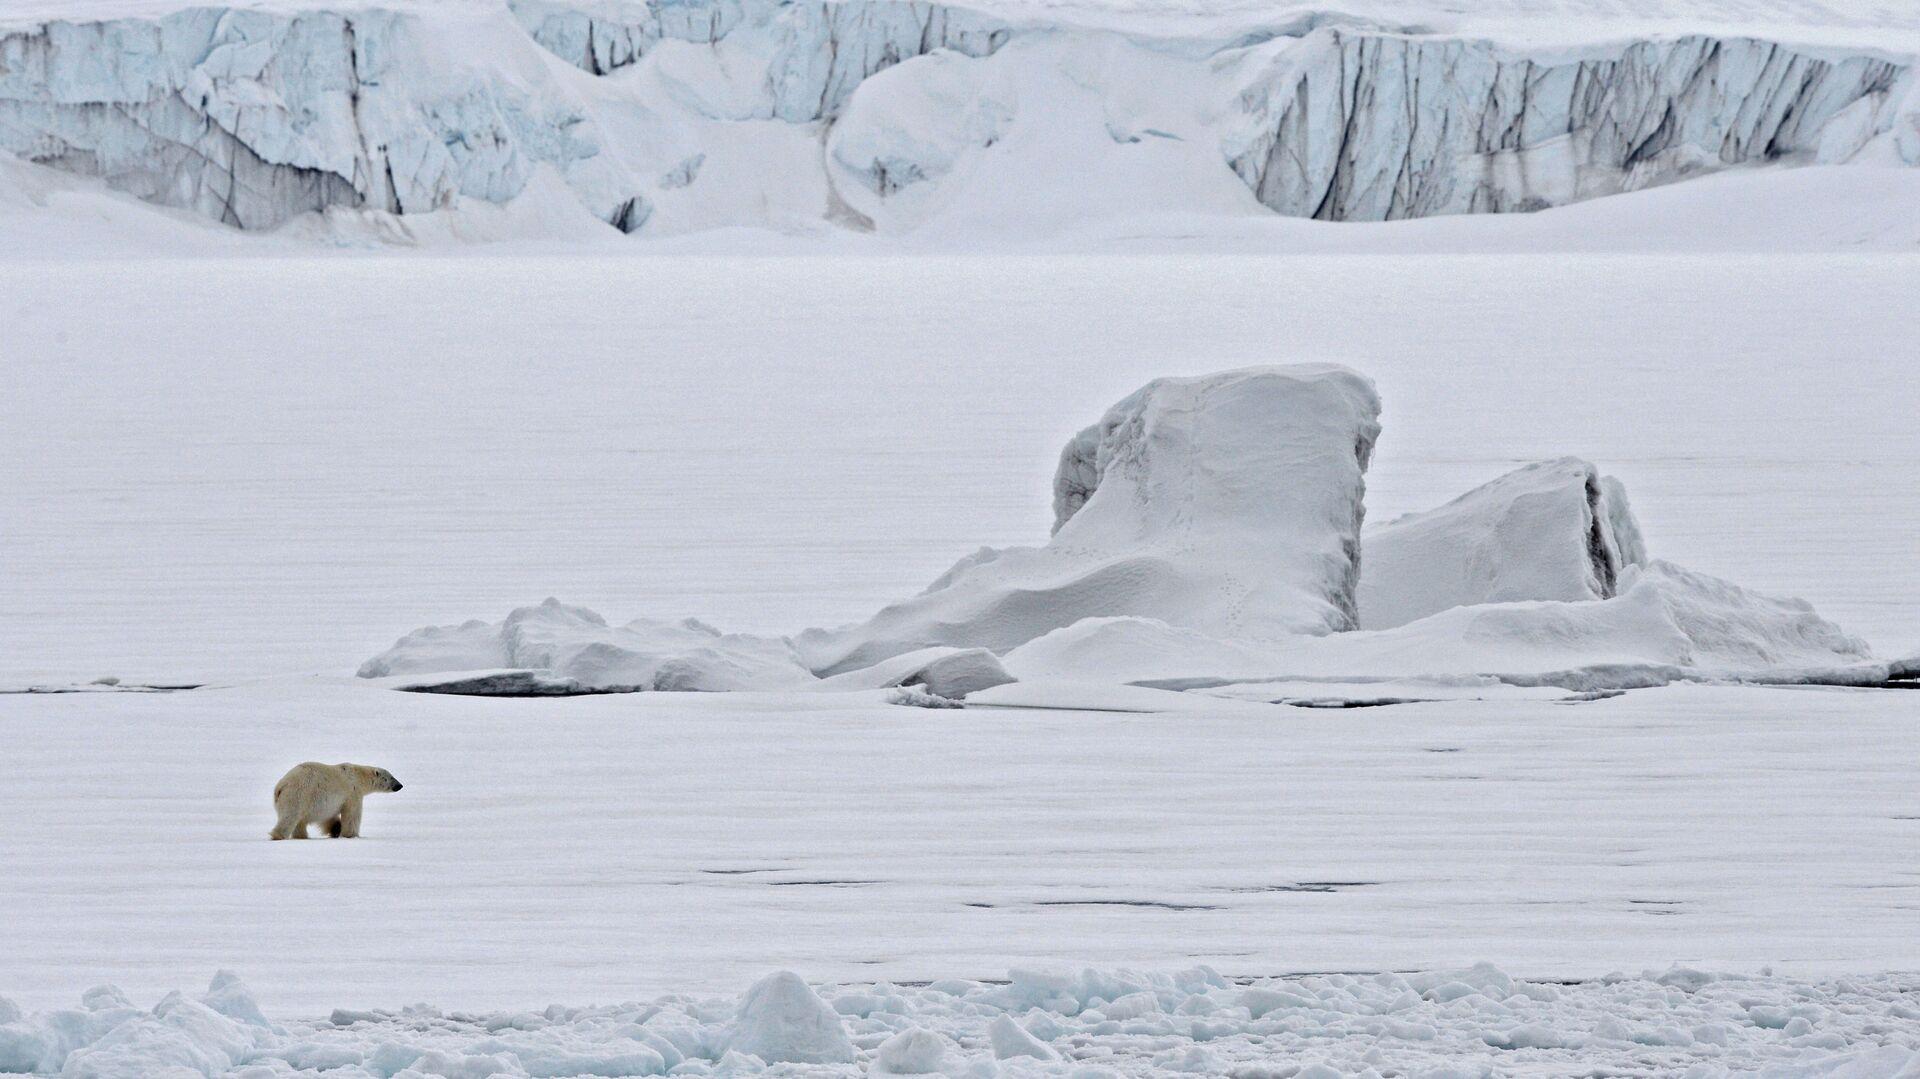 Un oso polar en un témpano de hielo en el Océano Ártico - Sputnik Mundo, 1920, 24.04.2021